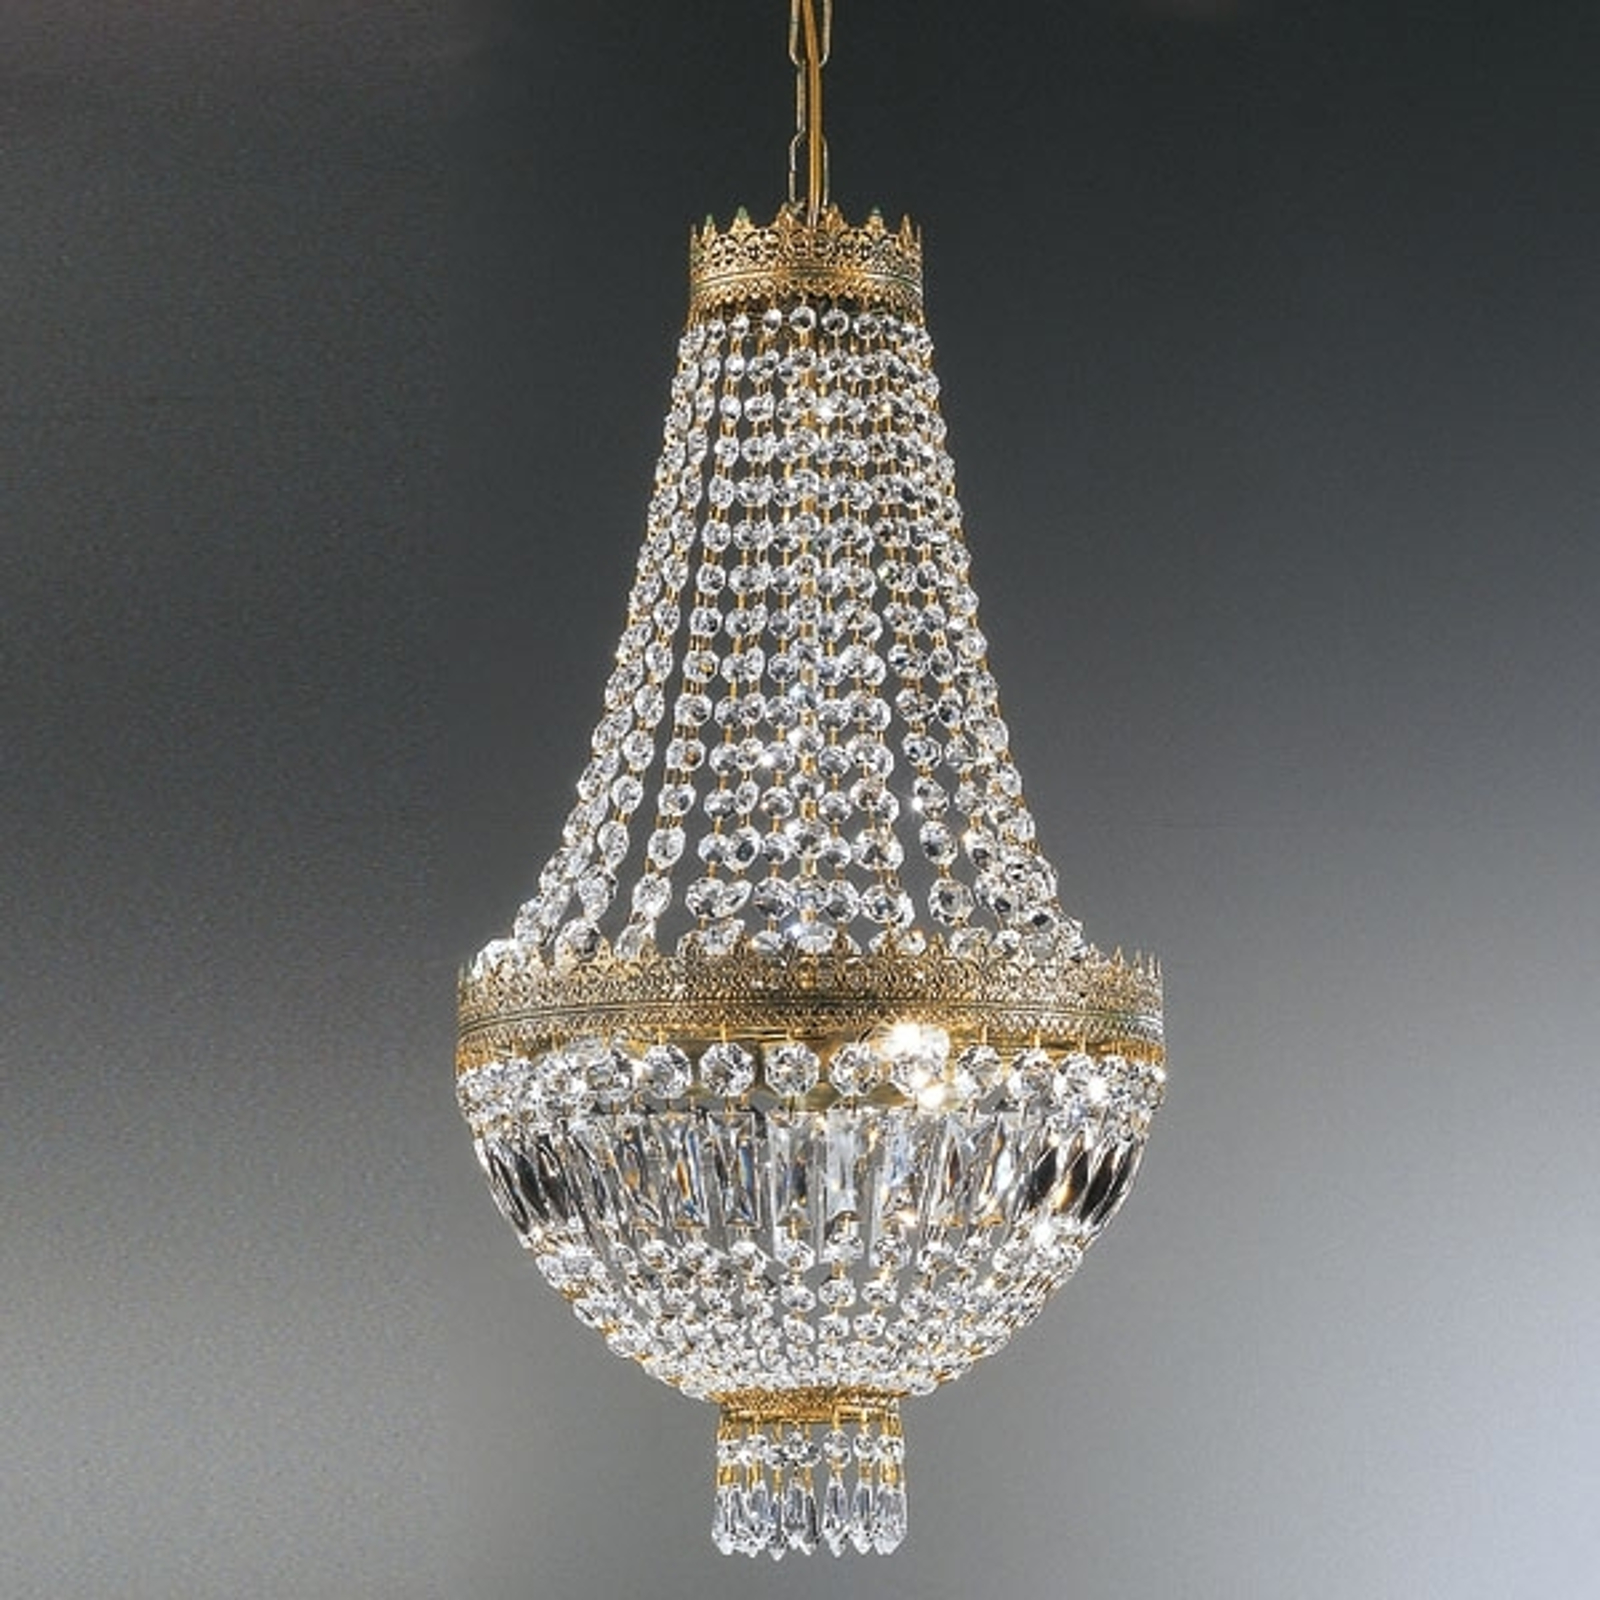 Kristallen hanglamp CUPOLA